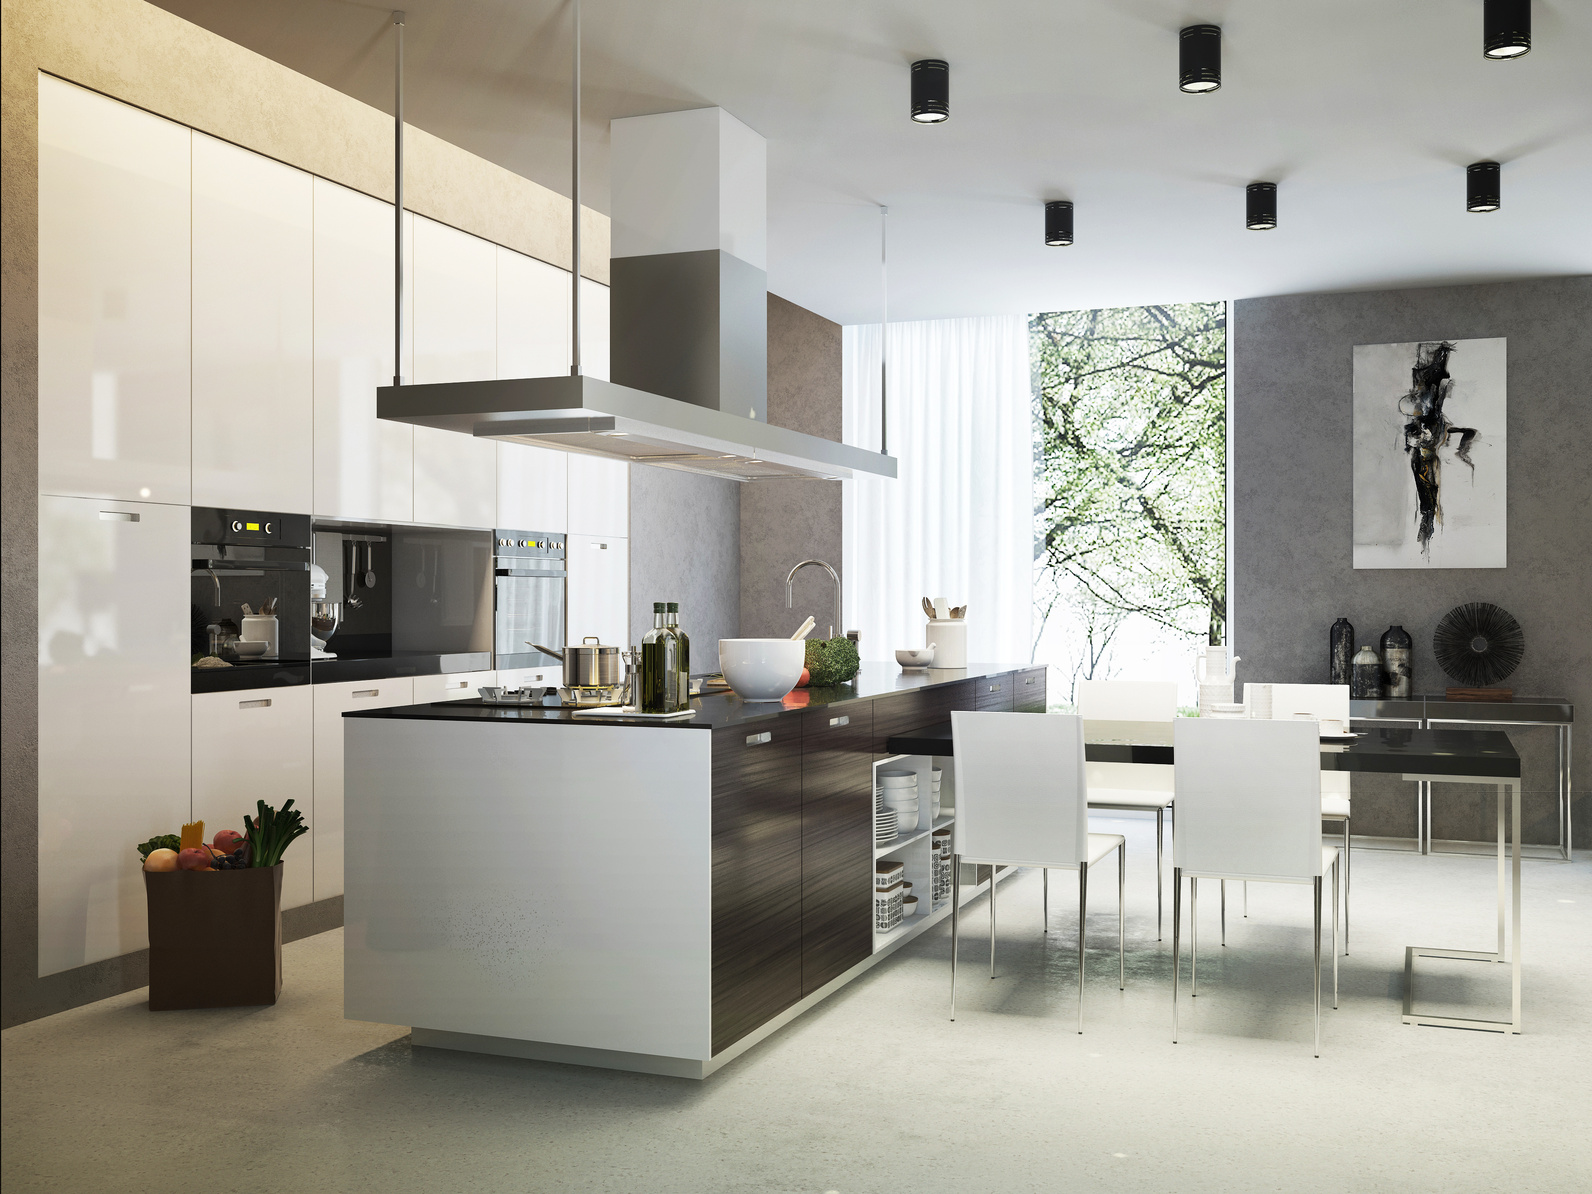 Küchen In Holzoptik: Projekt